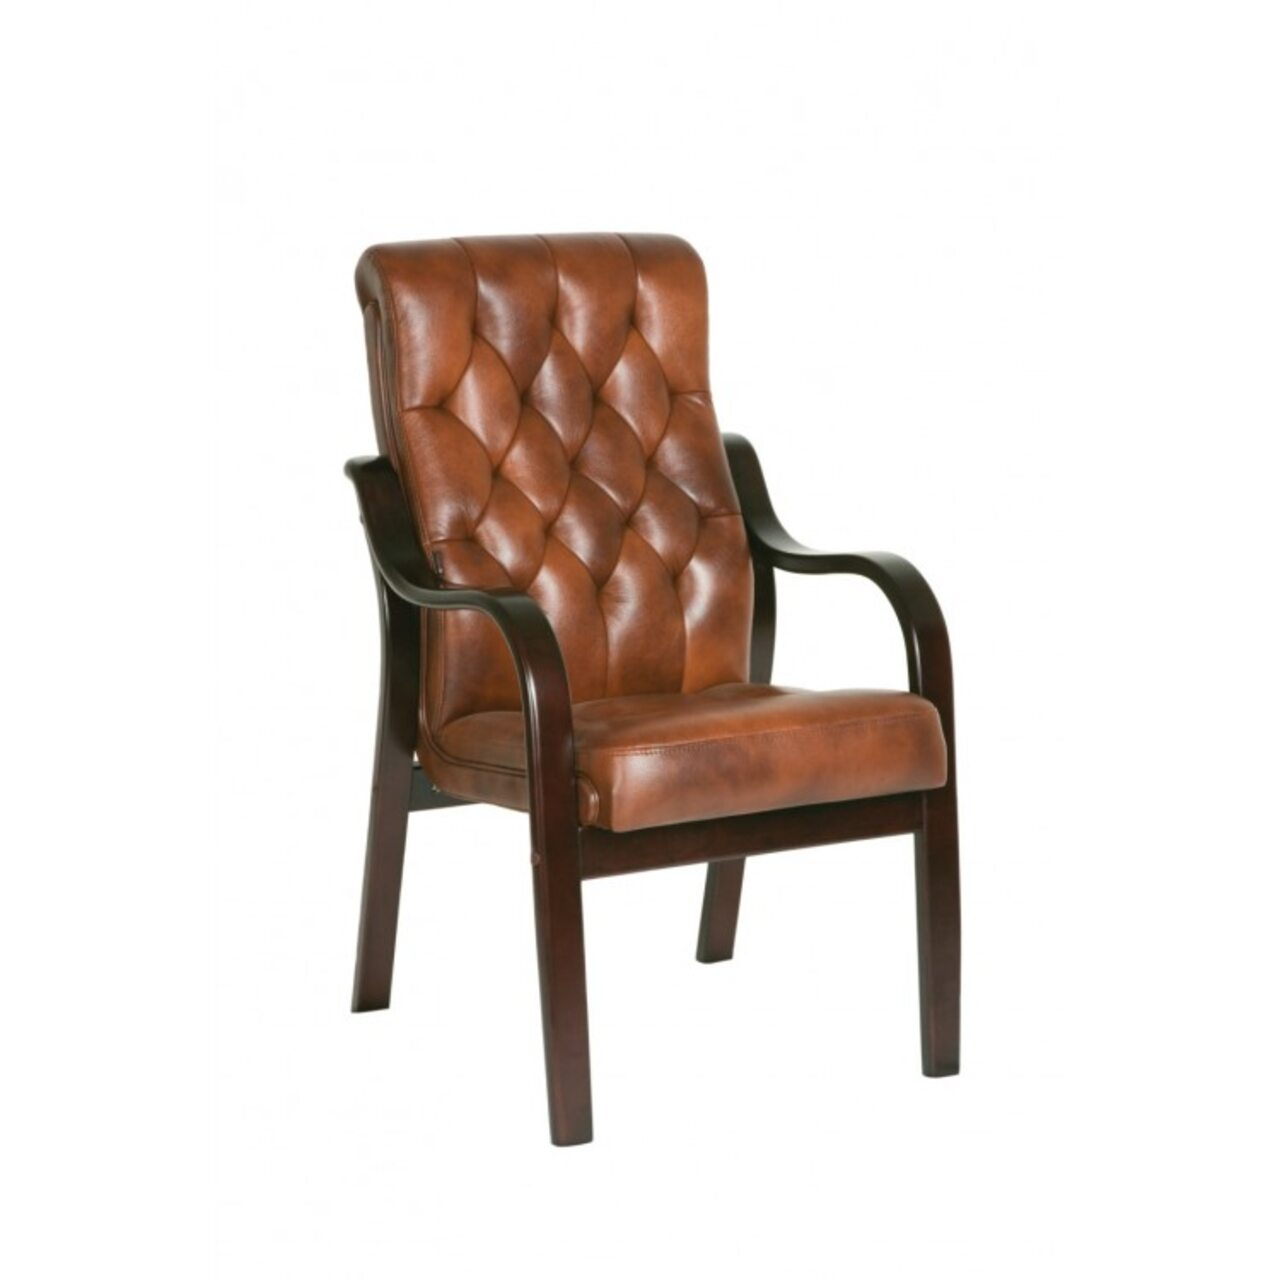 Классический стул Боттичелли DB-13LB - фото 1